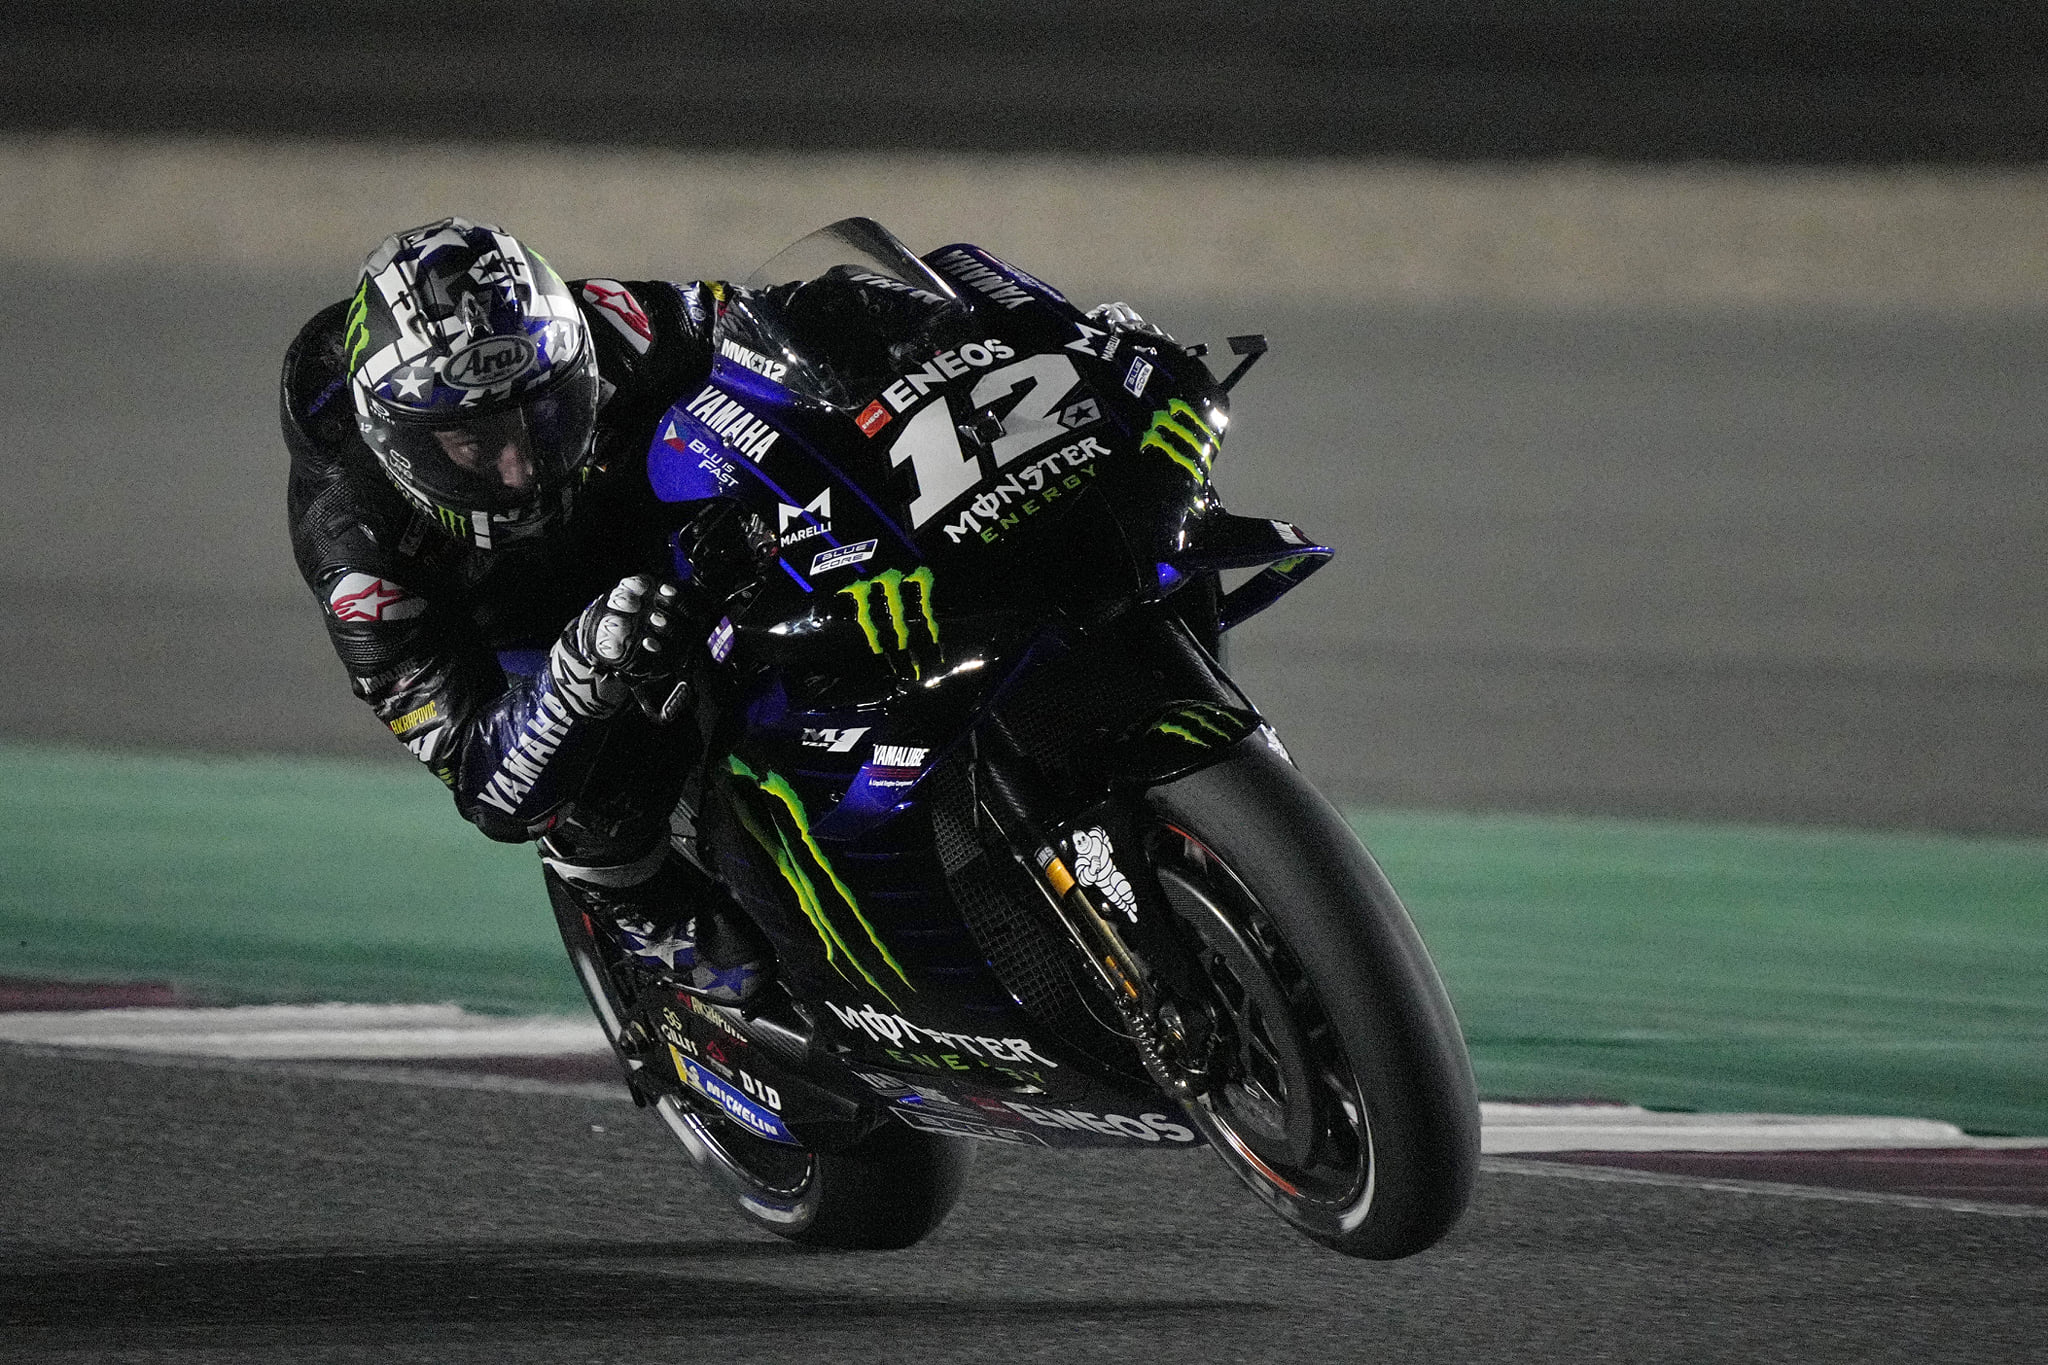 MotoGP. M. Vinalesas 2021 m. sezoną pradėjo pergale